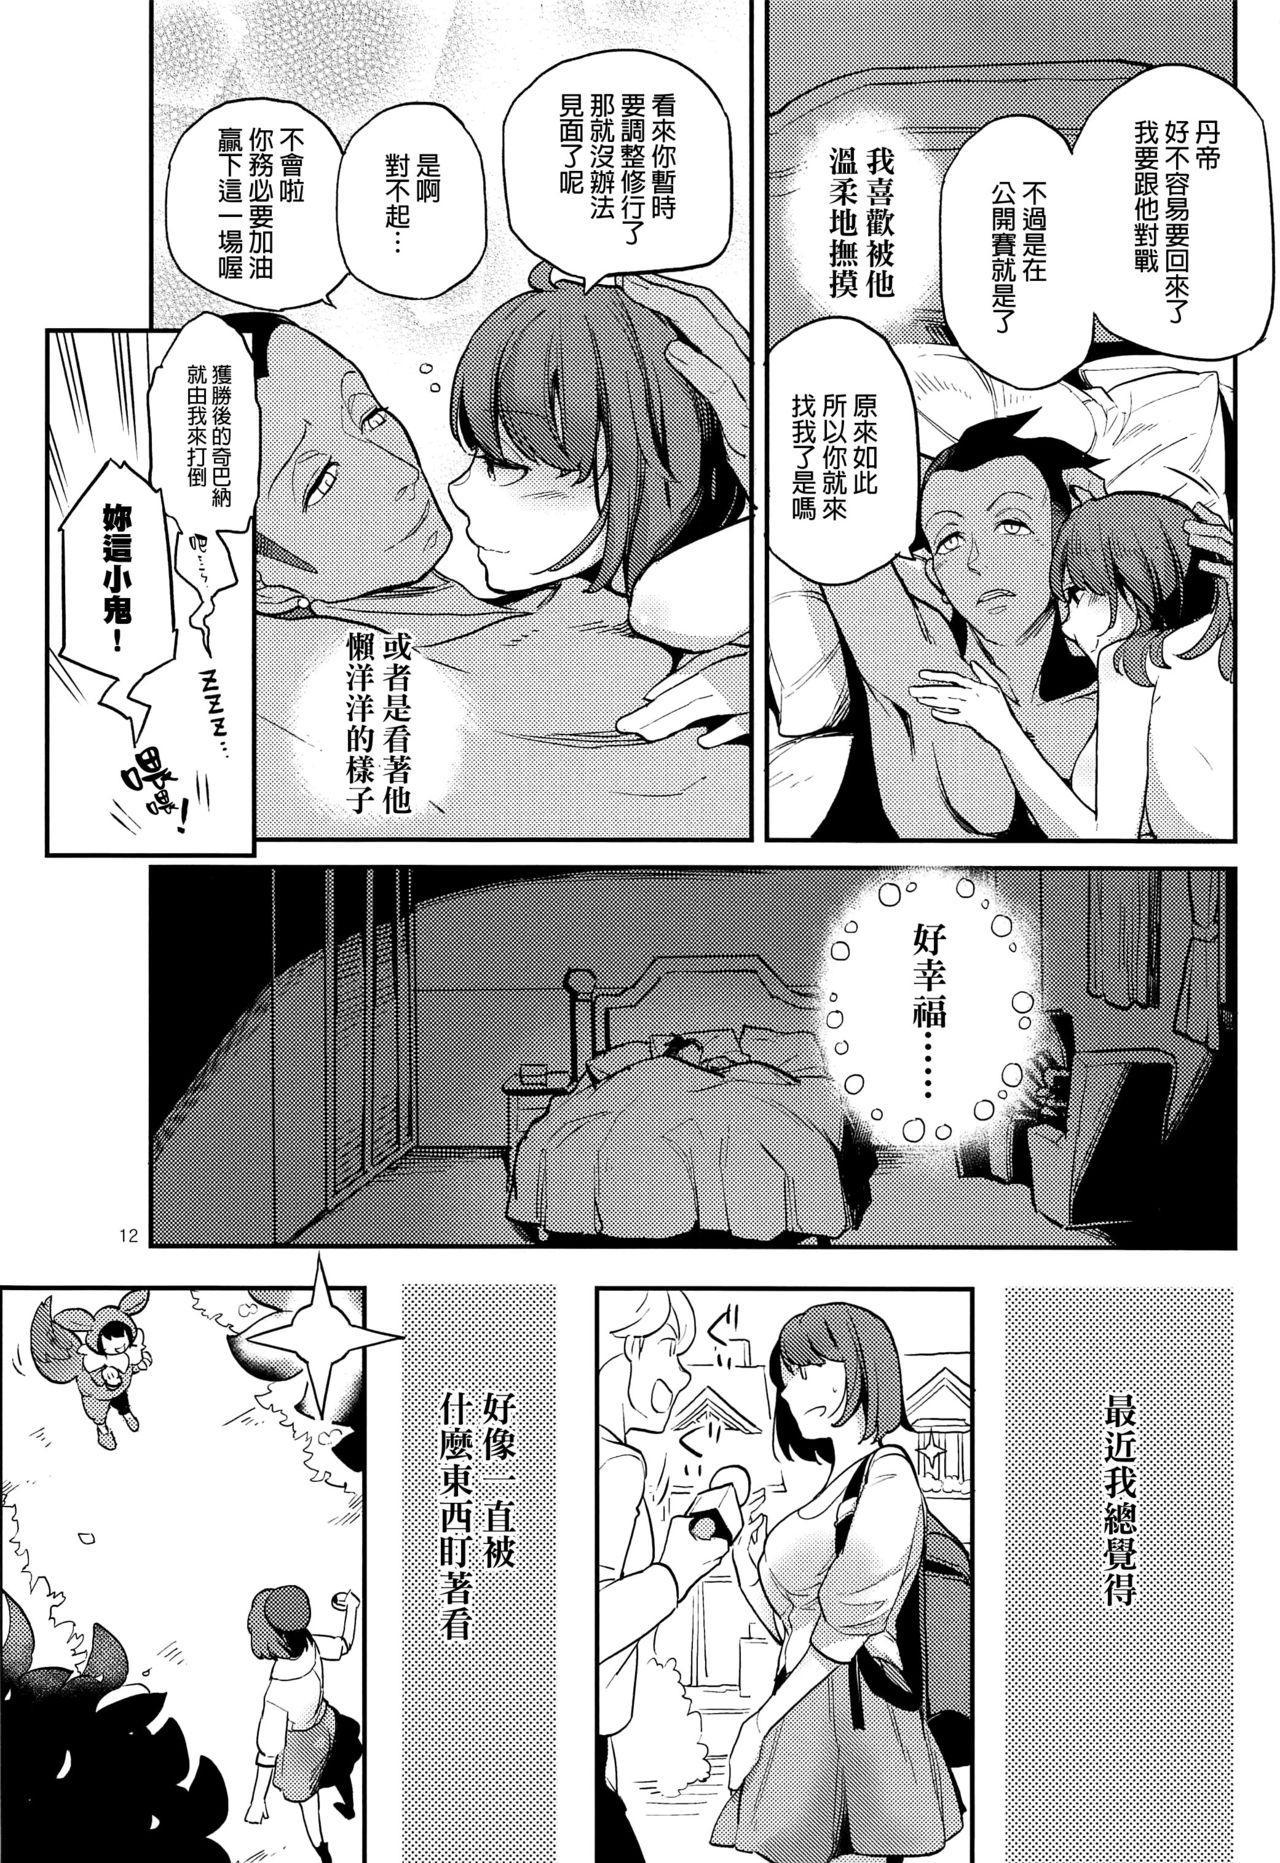 Kibana-san Gomennasai 10